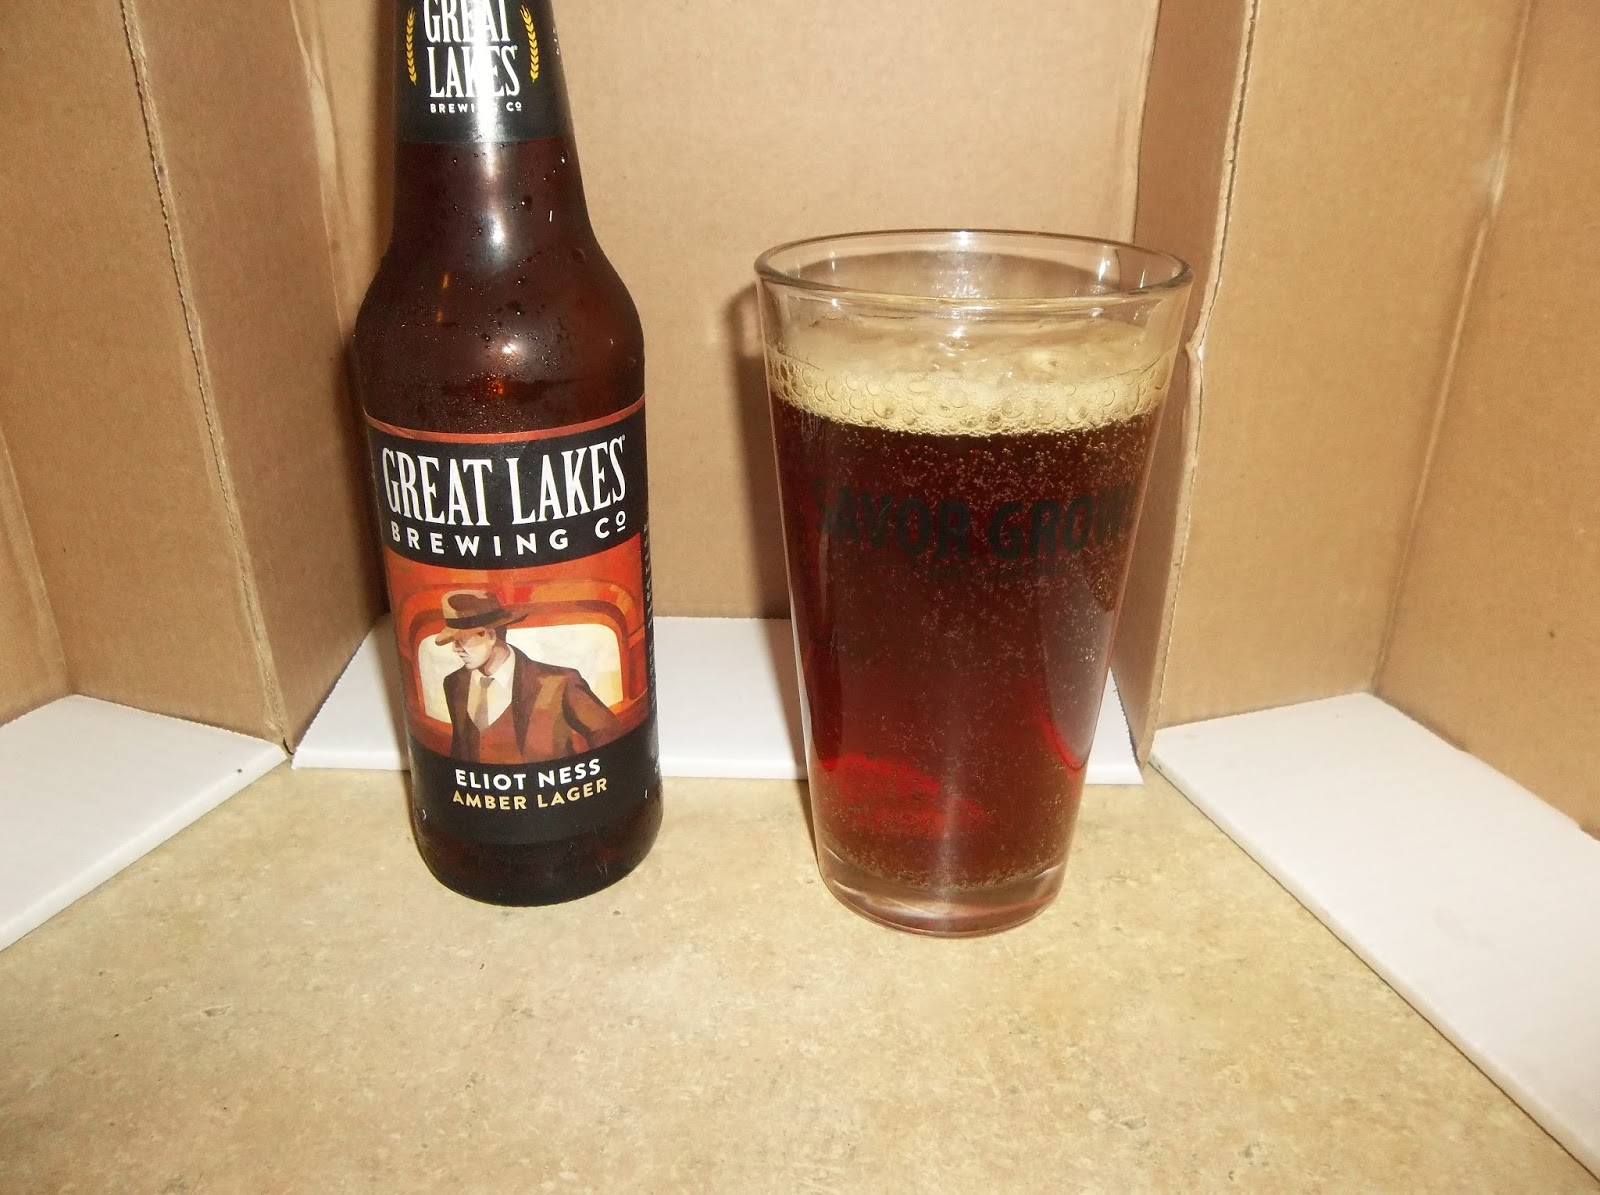 eliot ness beer - photo #15